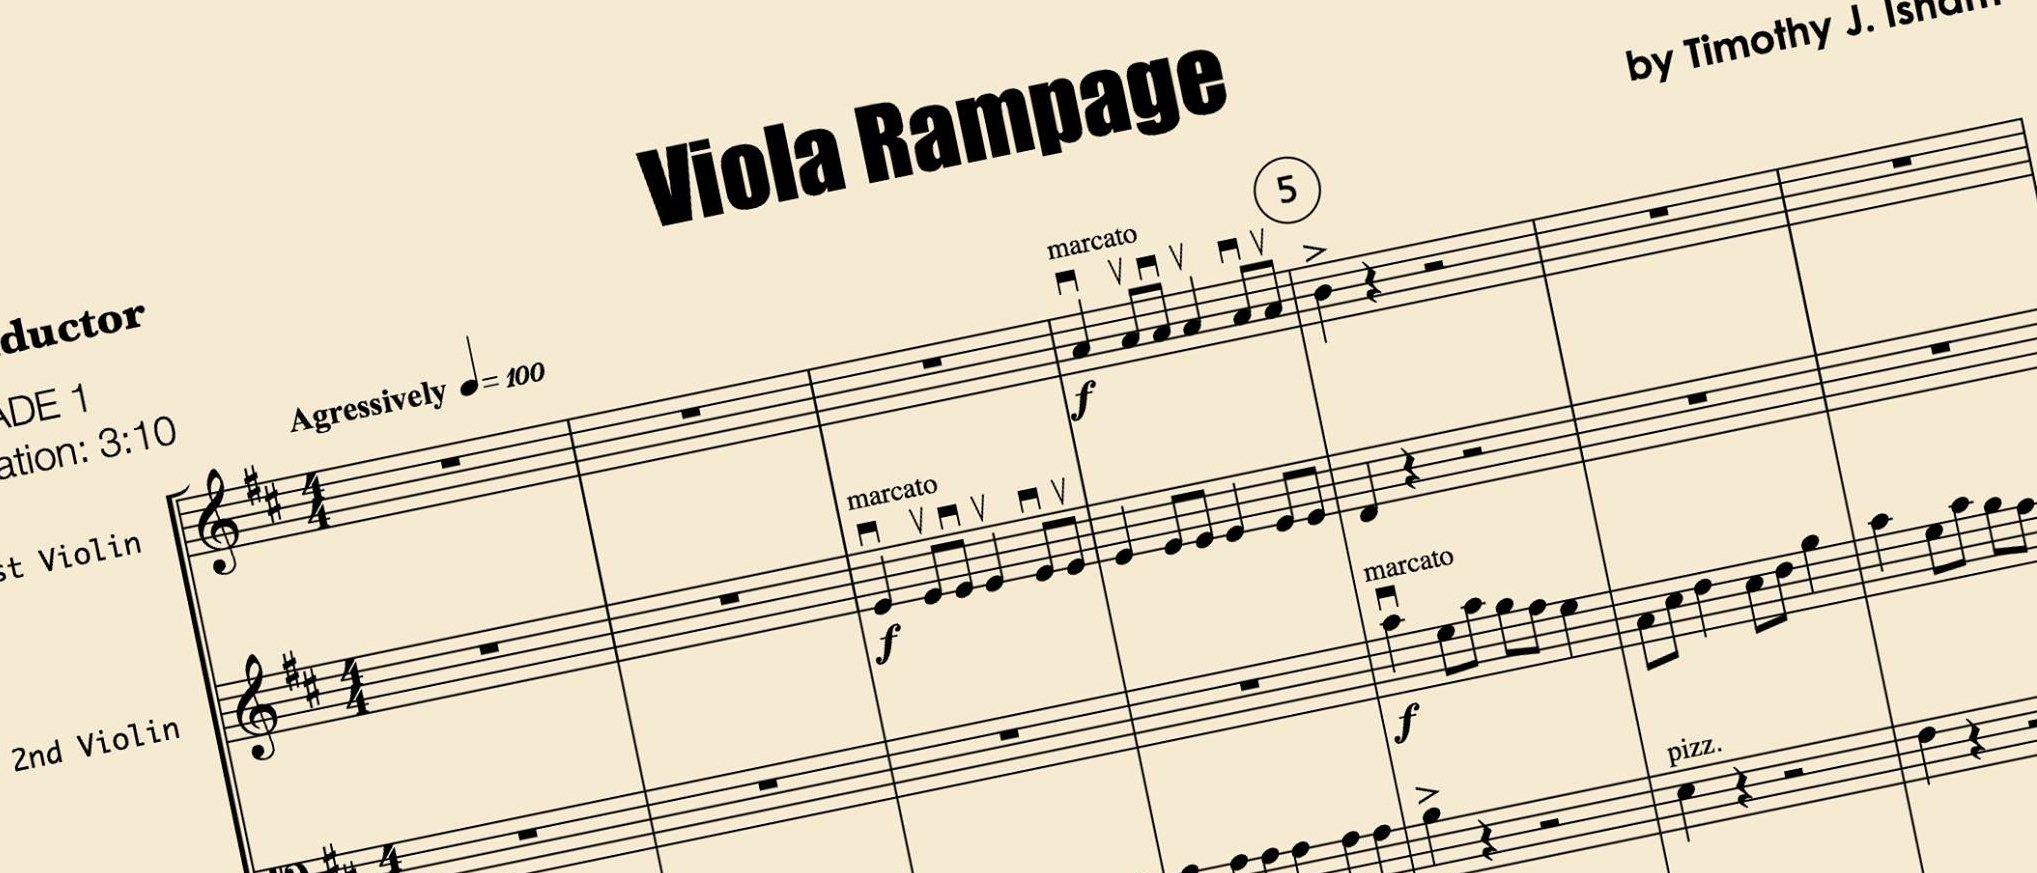 Viola Rampage is coming to Kendor